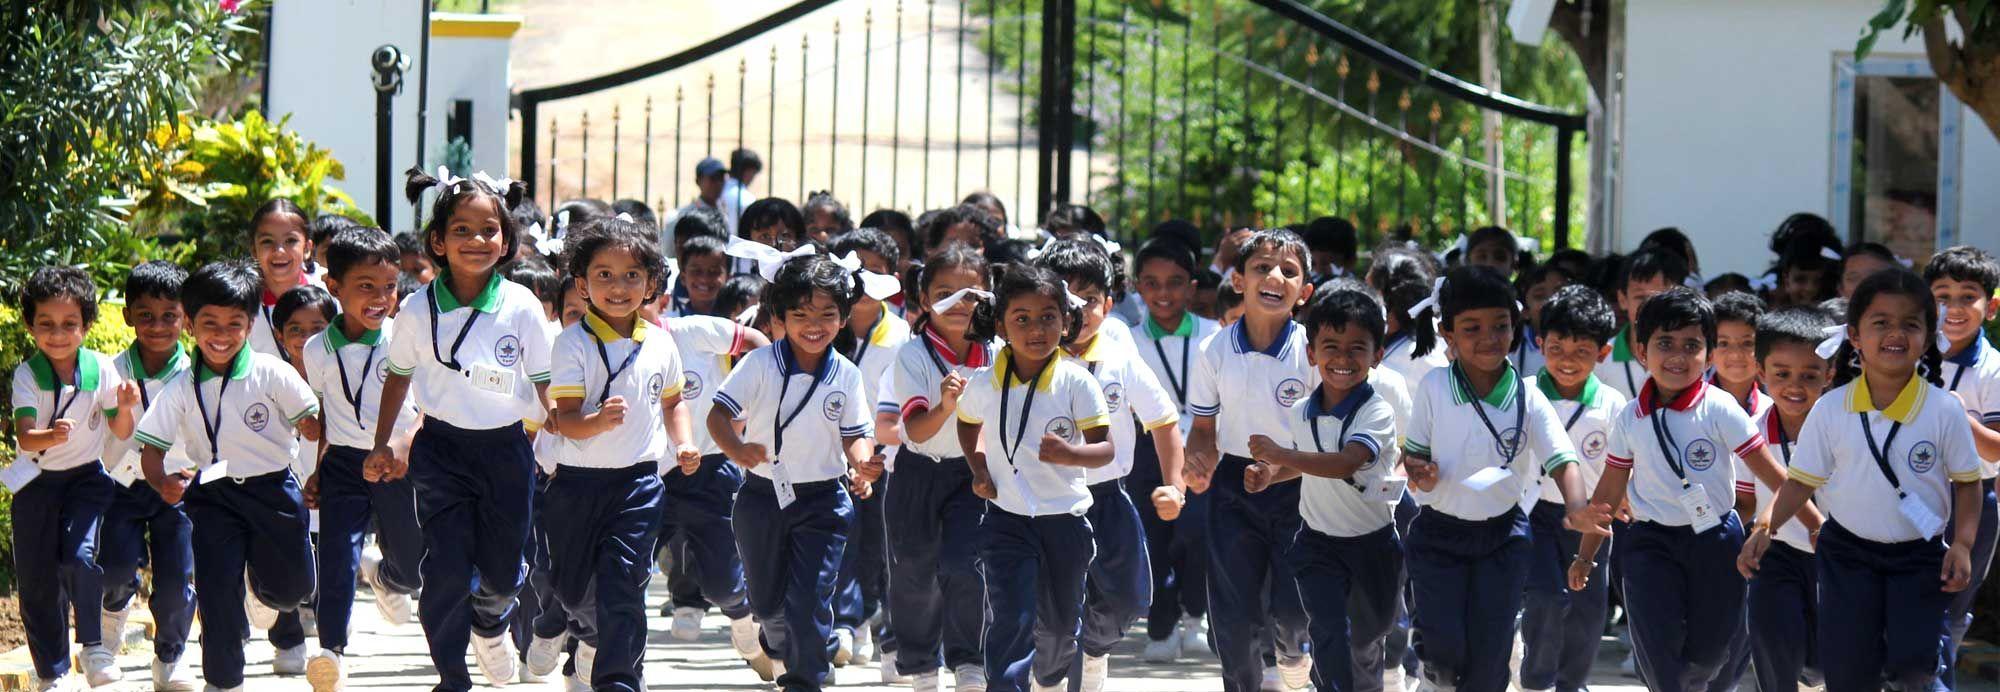 Schools In Hosur Zee School Hosur Cbse Schools In Hosur Litera